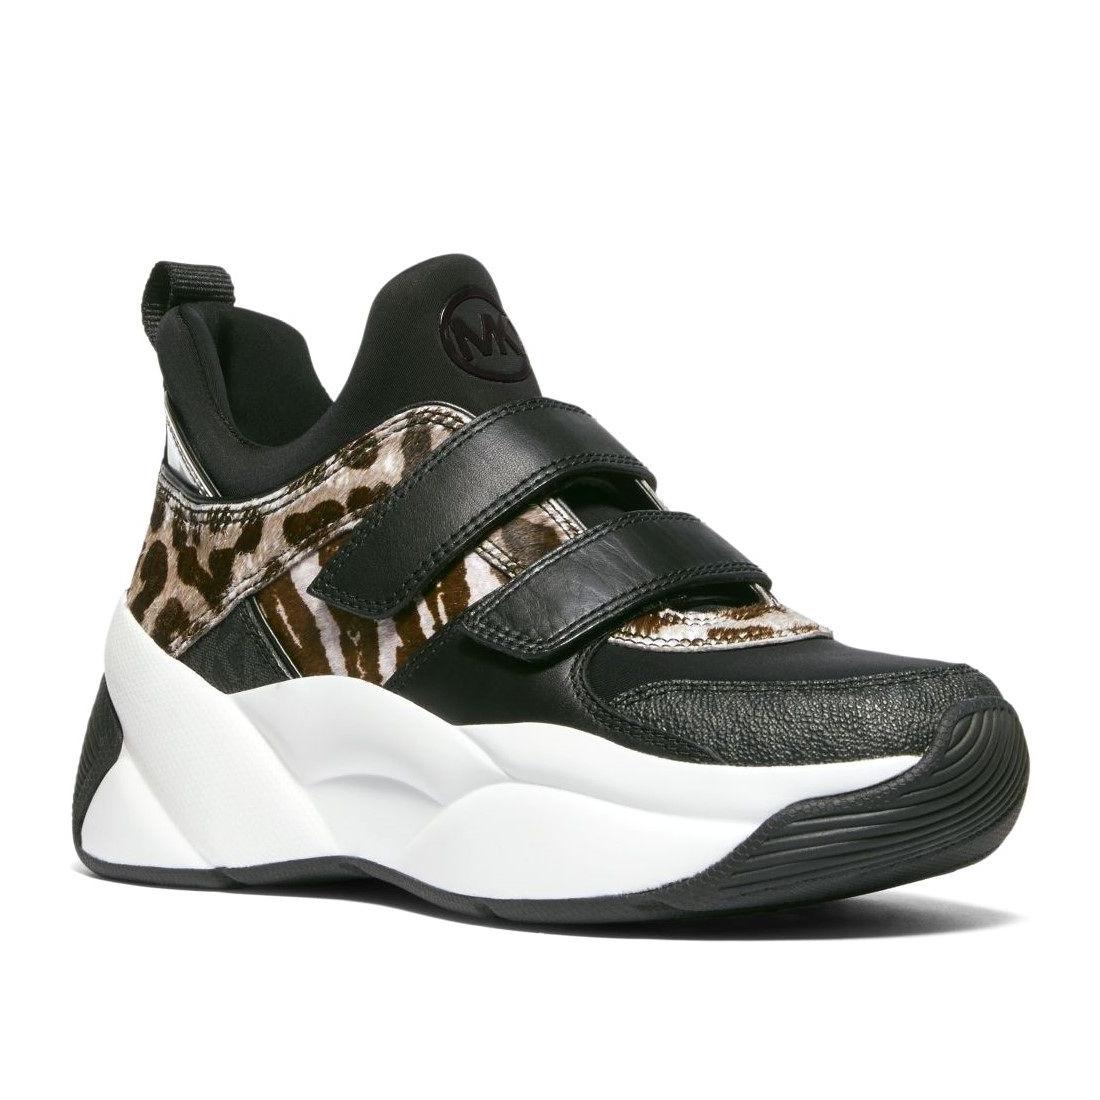 sneakers woman michael kors 43f9kefs1h041 6072